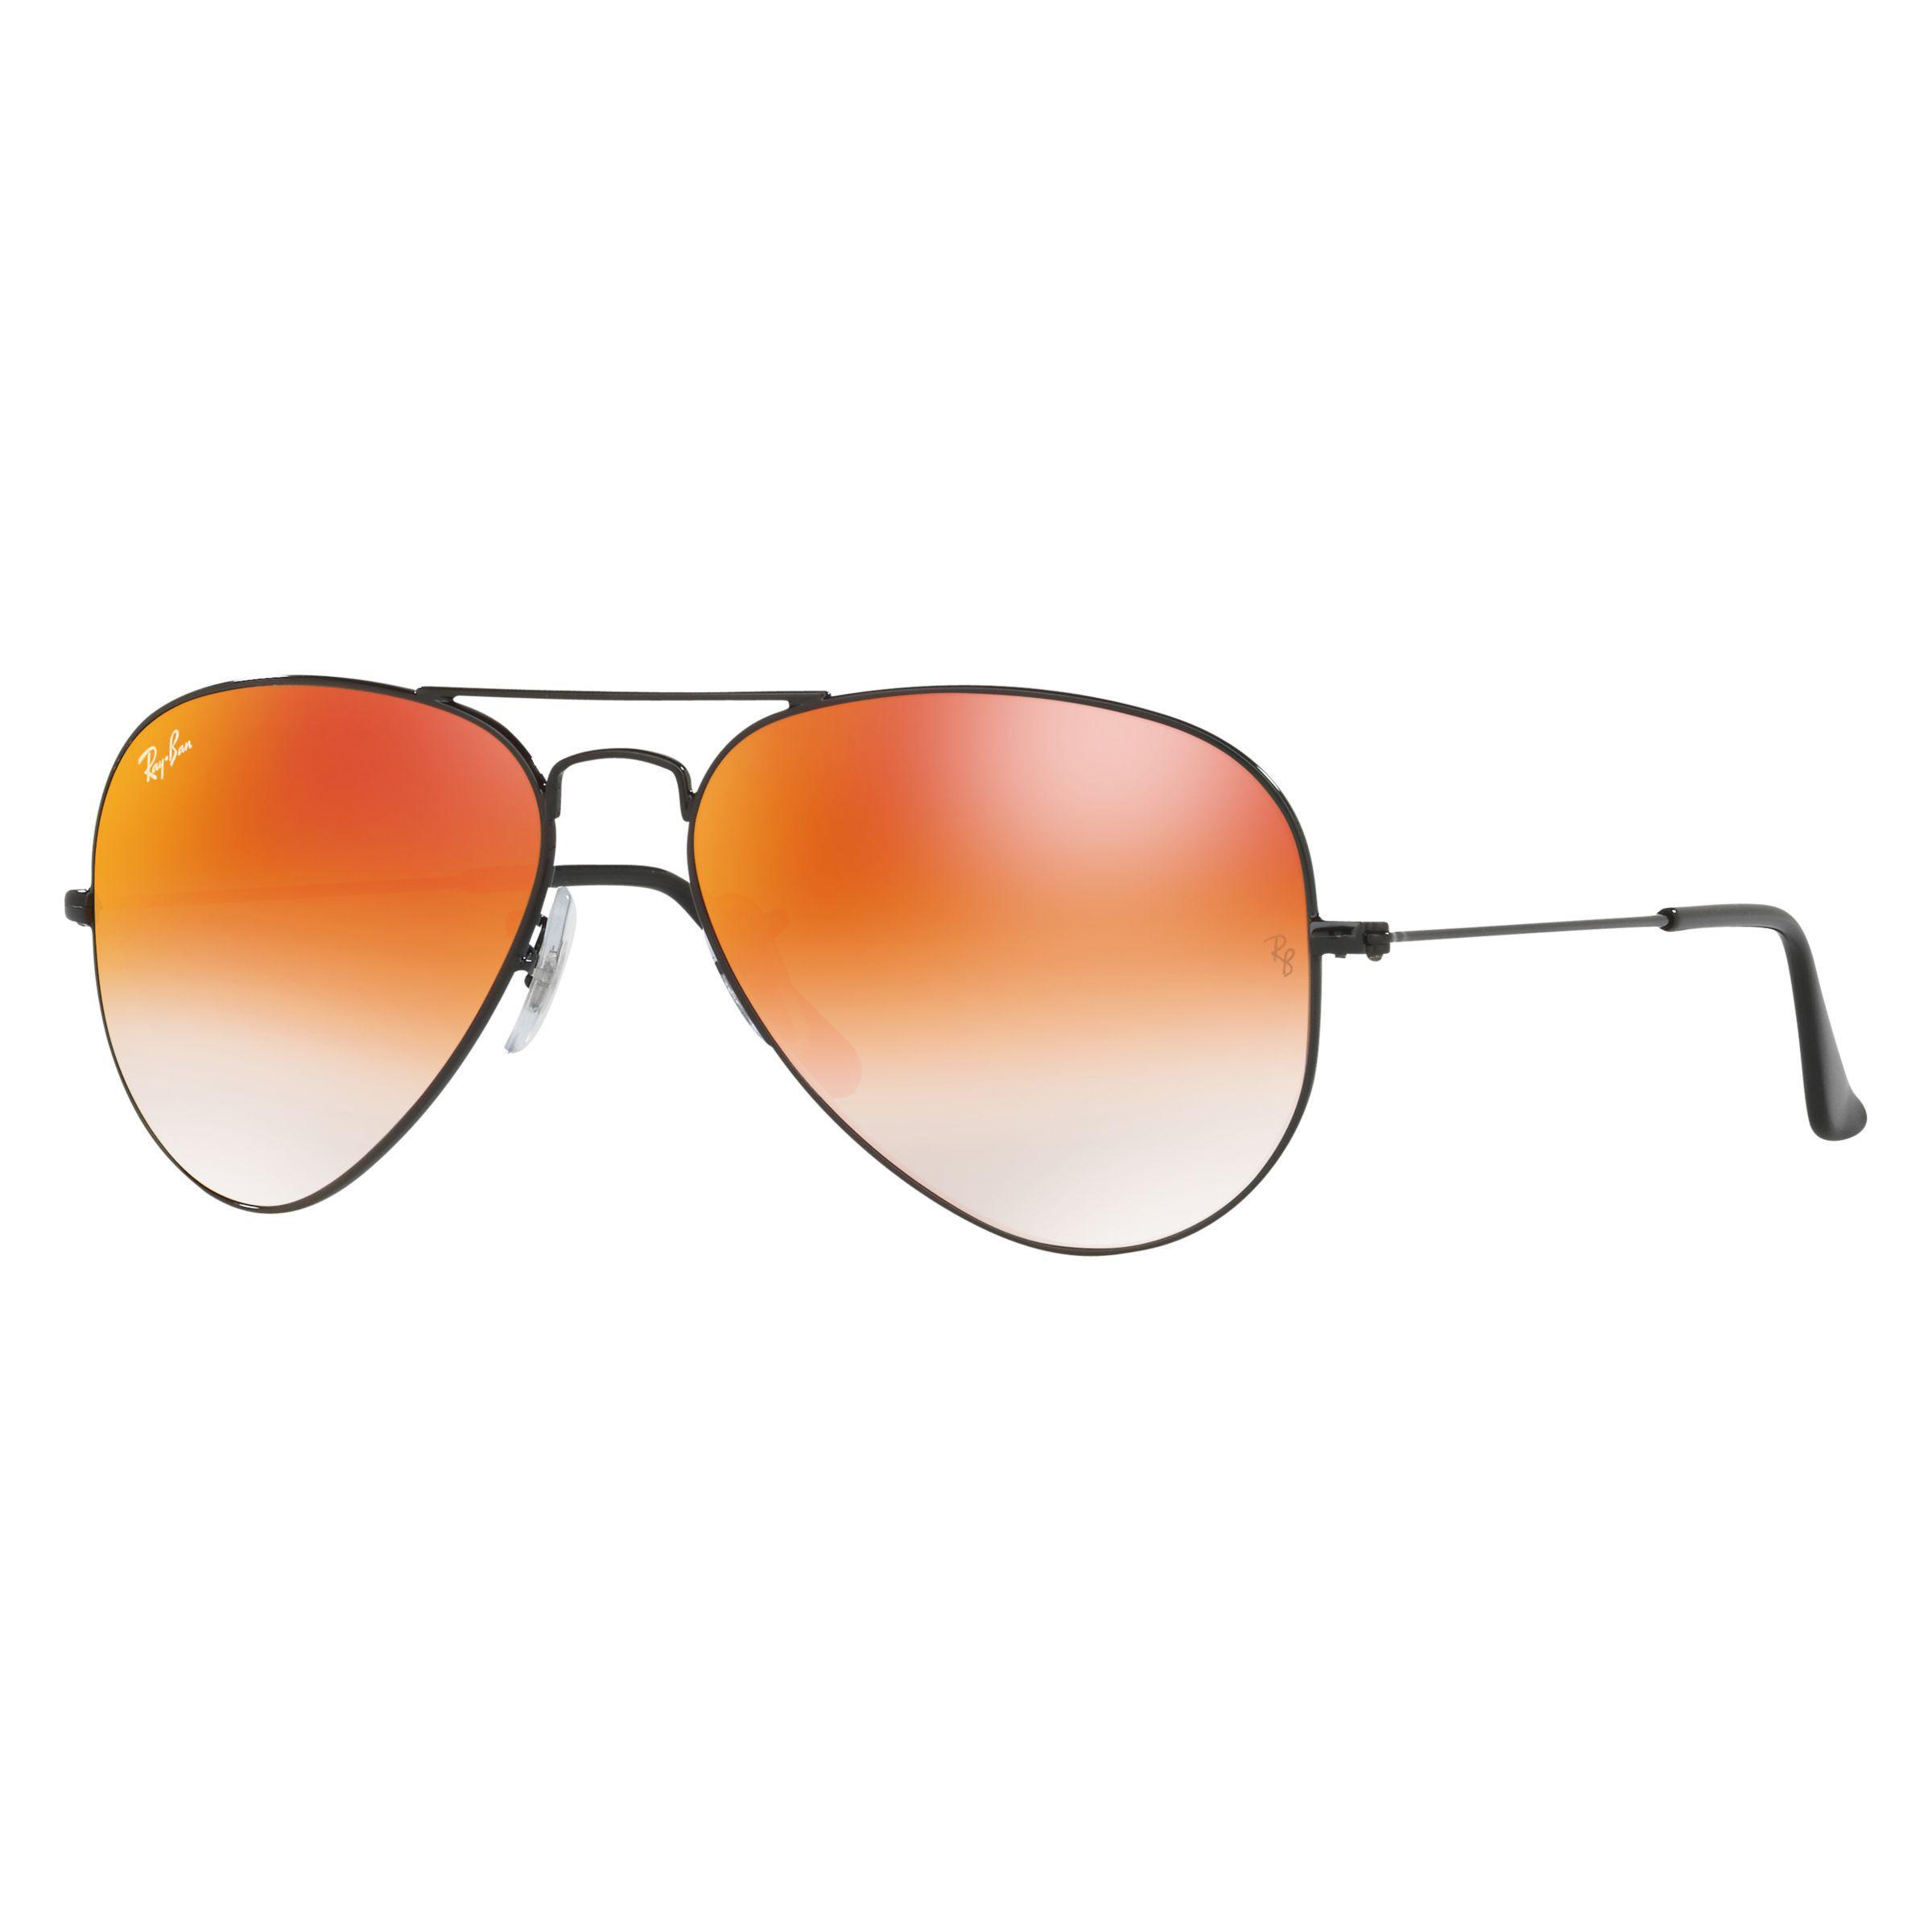 5dac845b28 Ray-Ban Rb3025 Aviator Flash Lenses Sunglasses for Men - Lyst